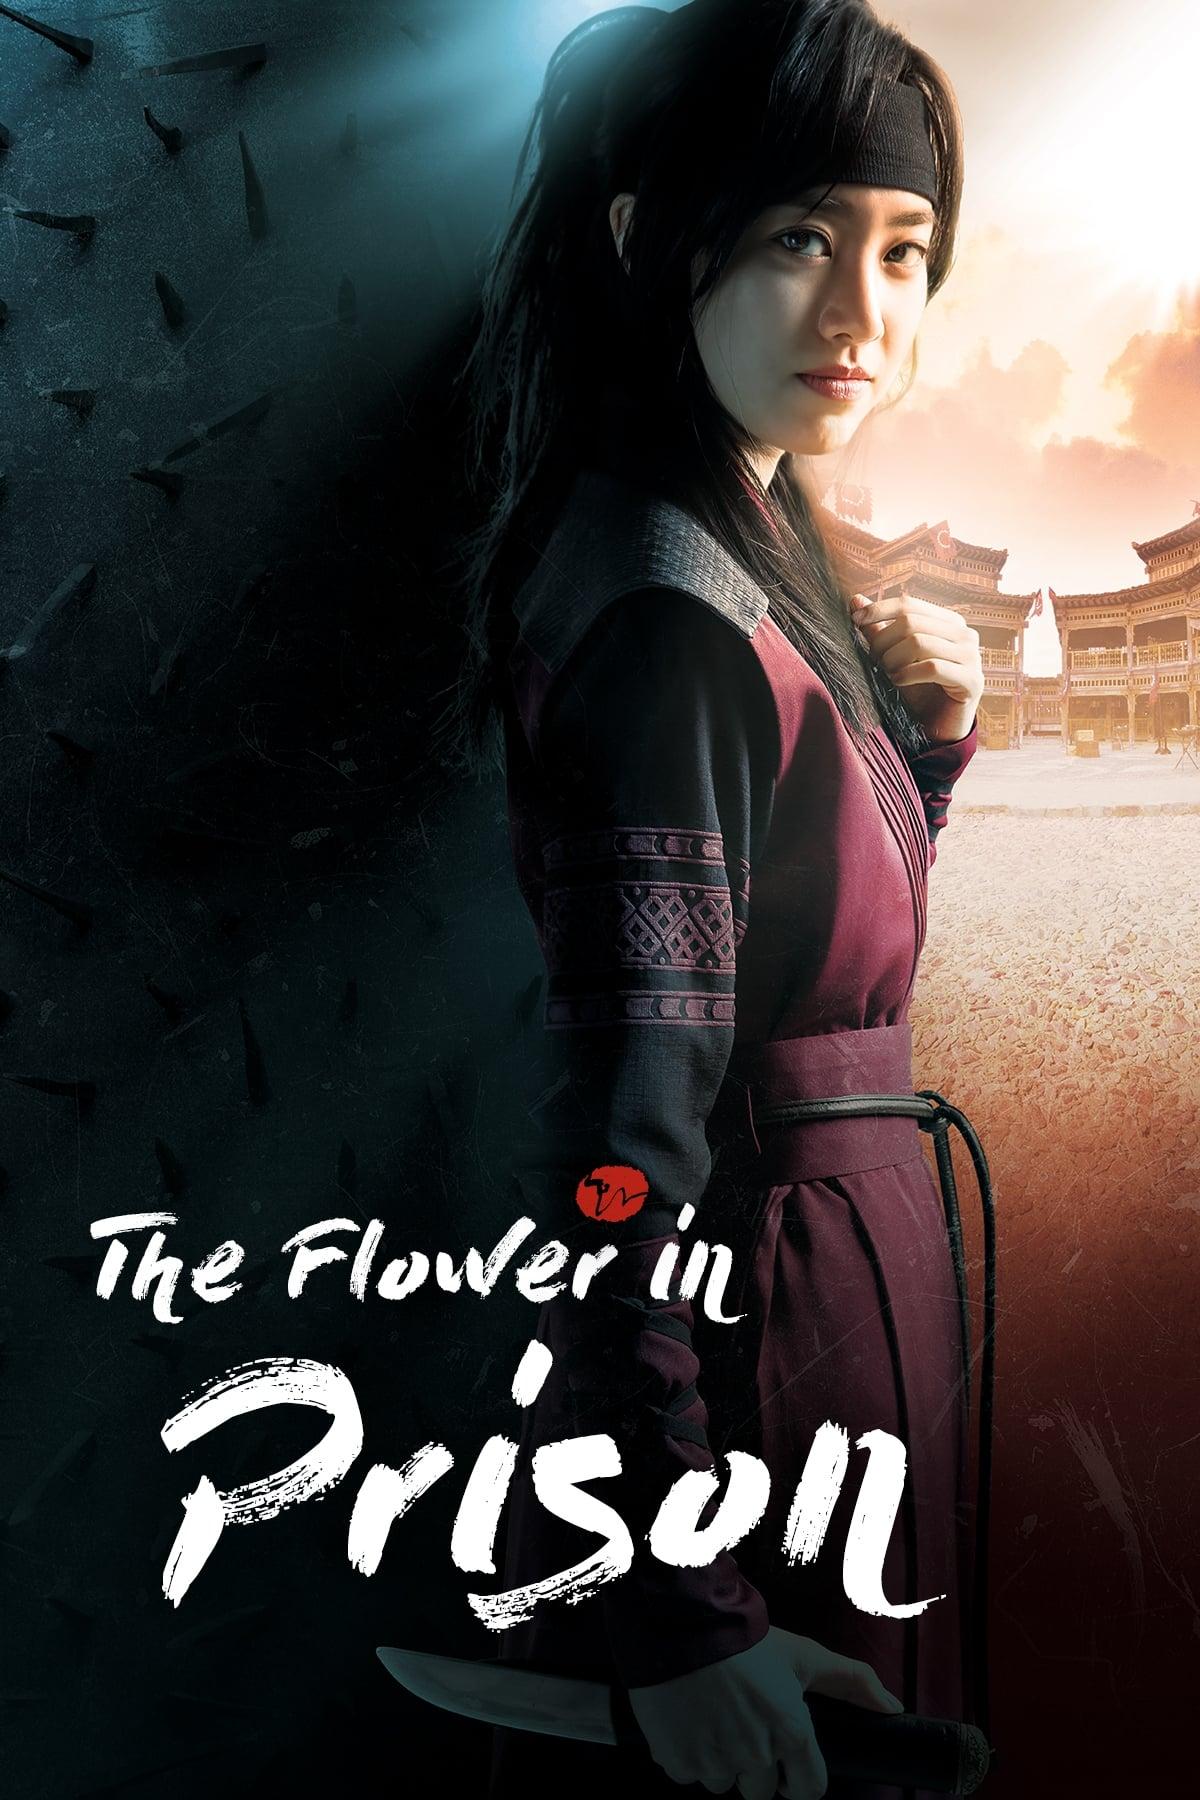 The Flower in Prison (2016)